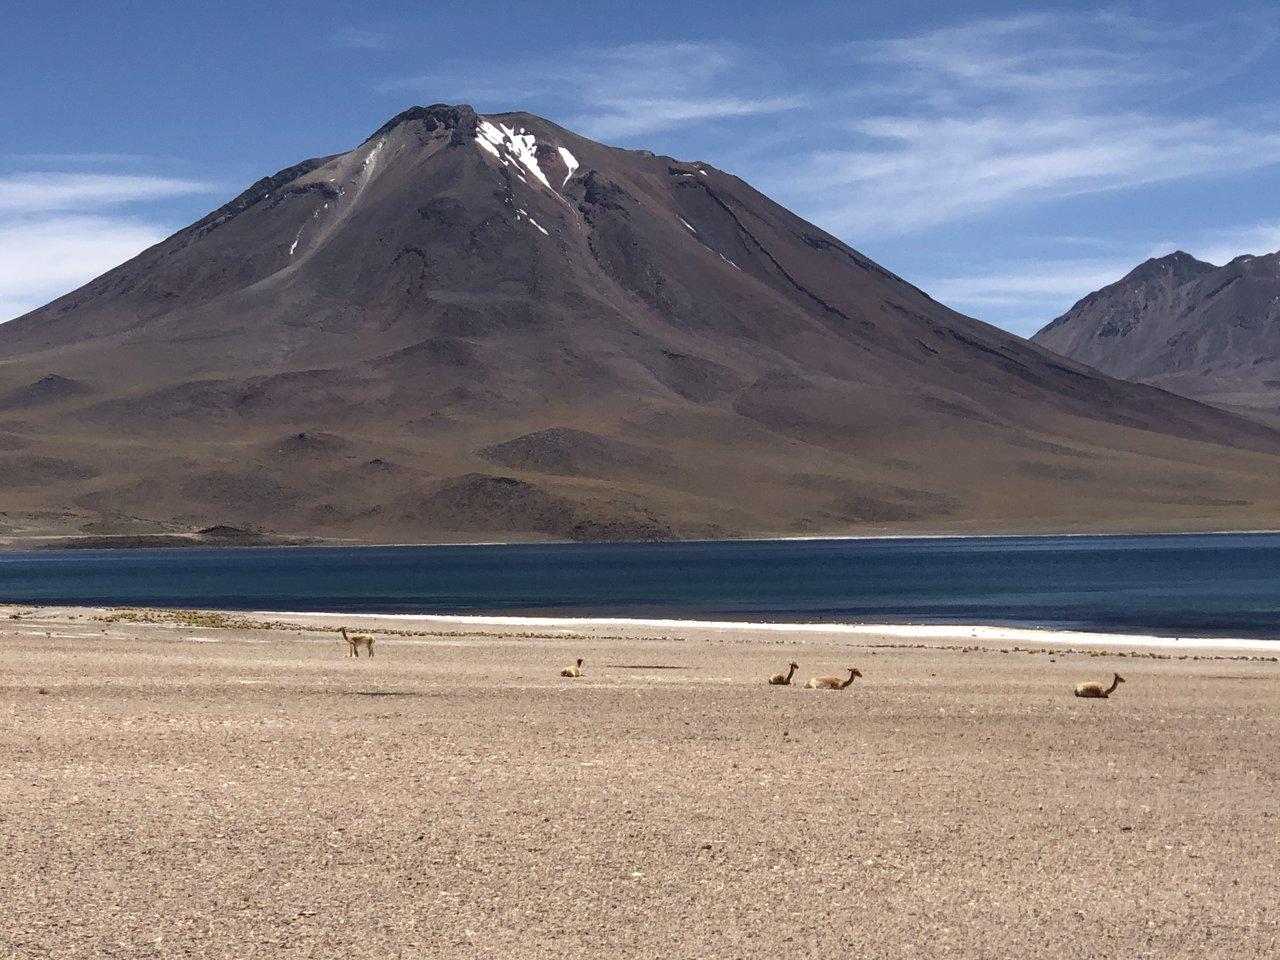 High Desert in Atacama Desert | Photo taken by Melody B